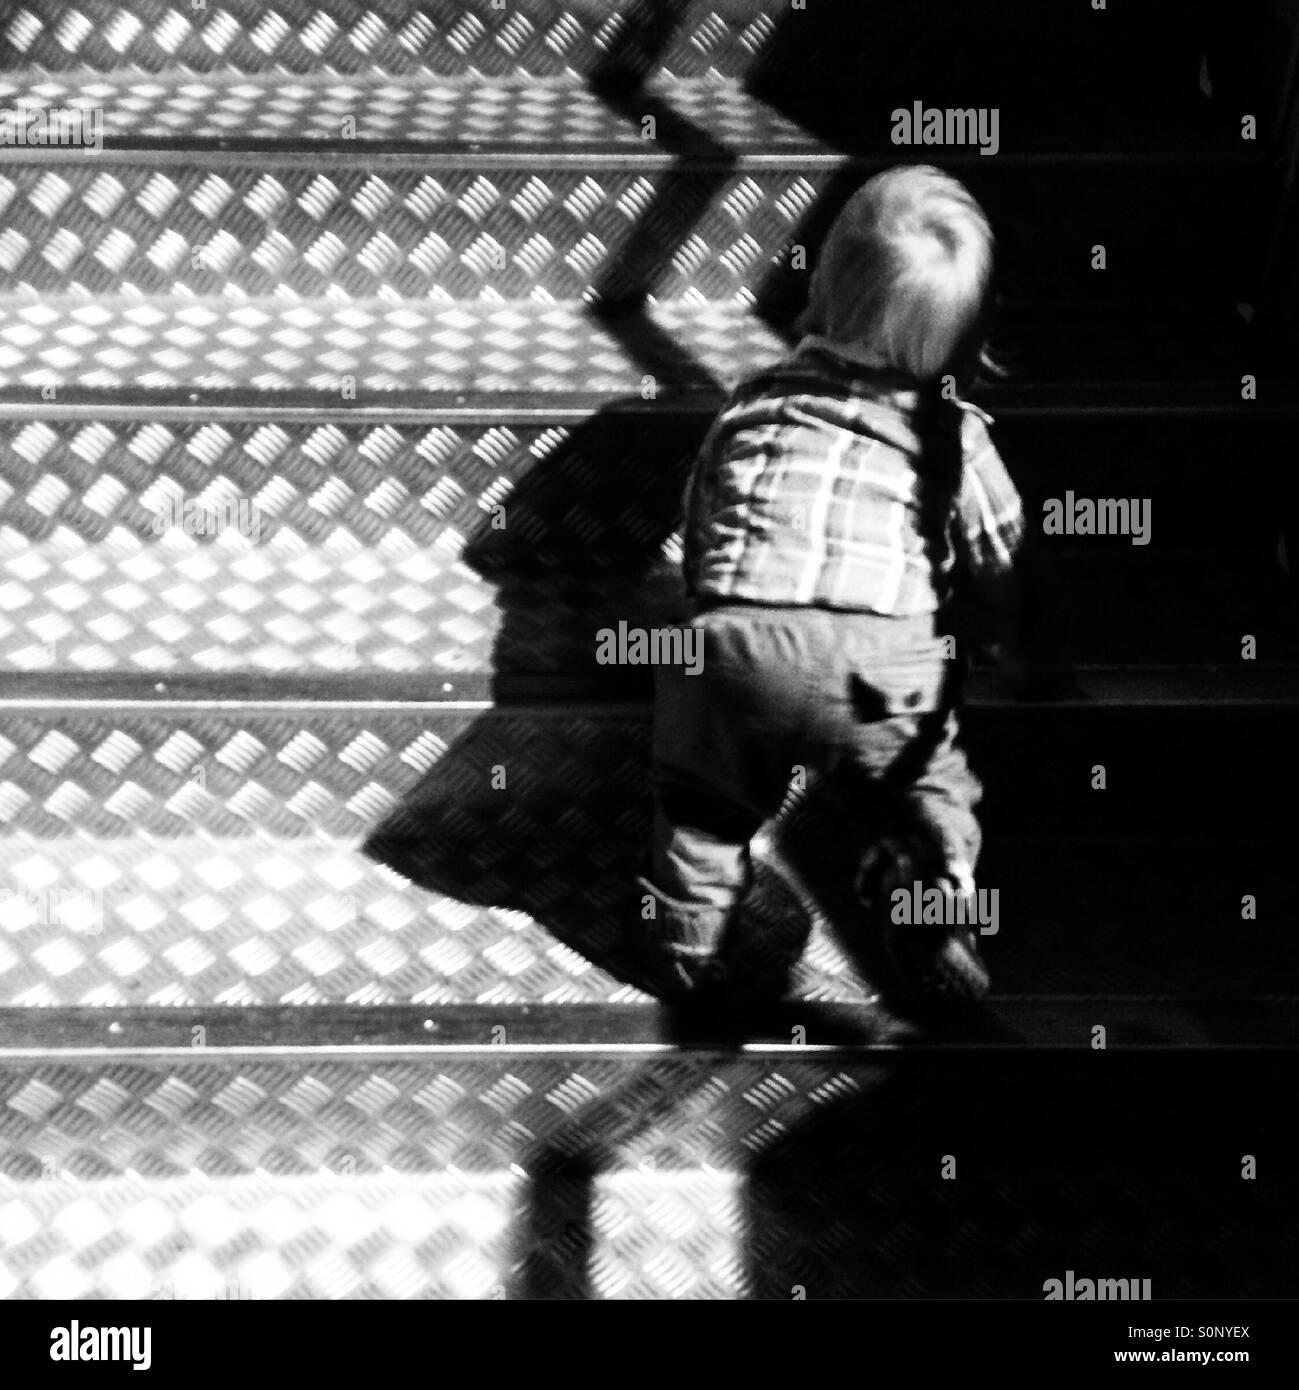 Niño Niño subir escaleras Imagen De Stock